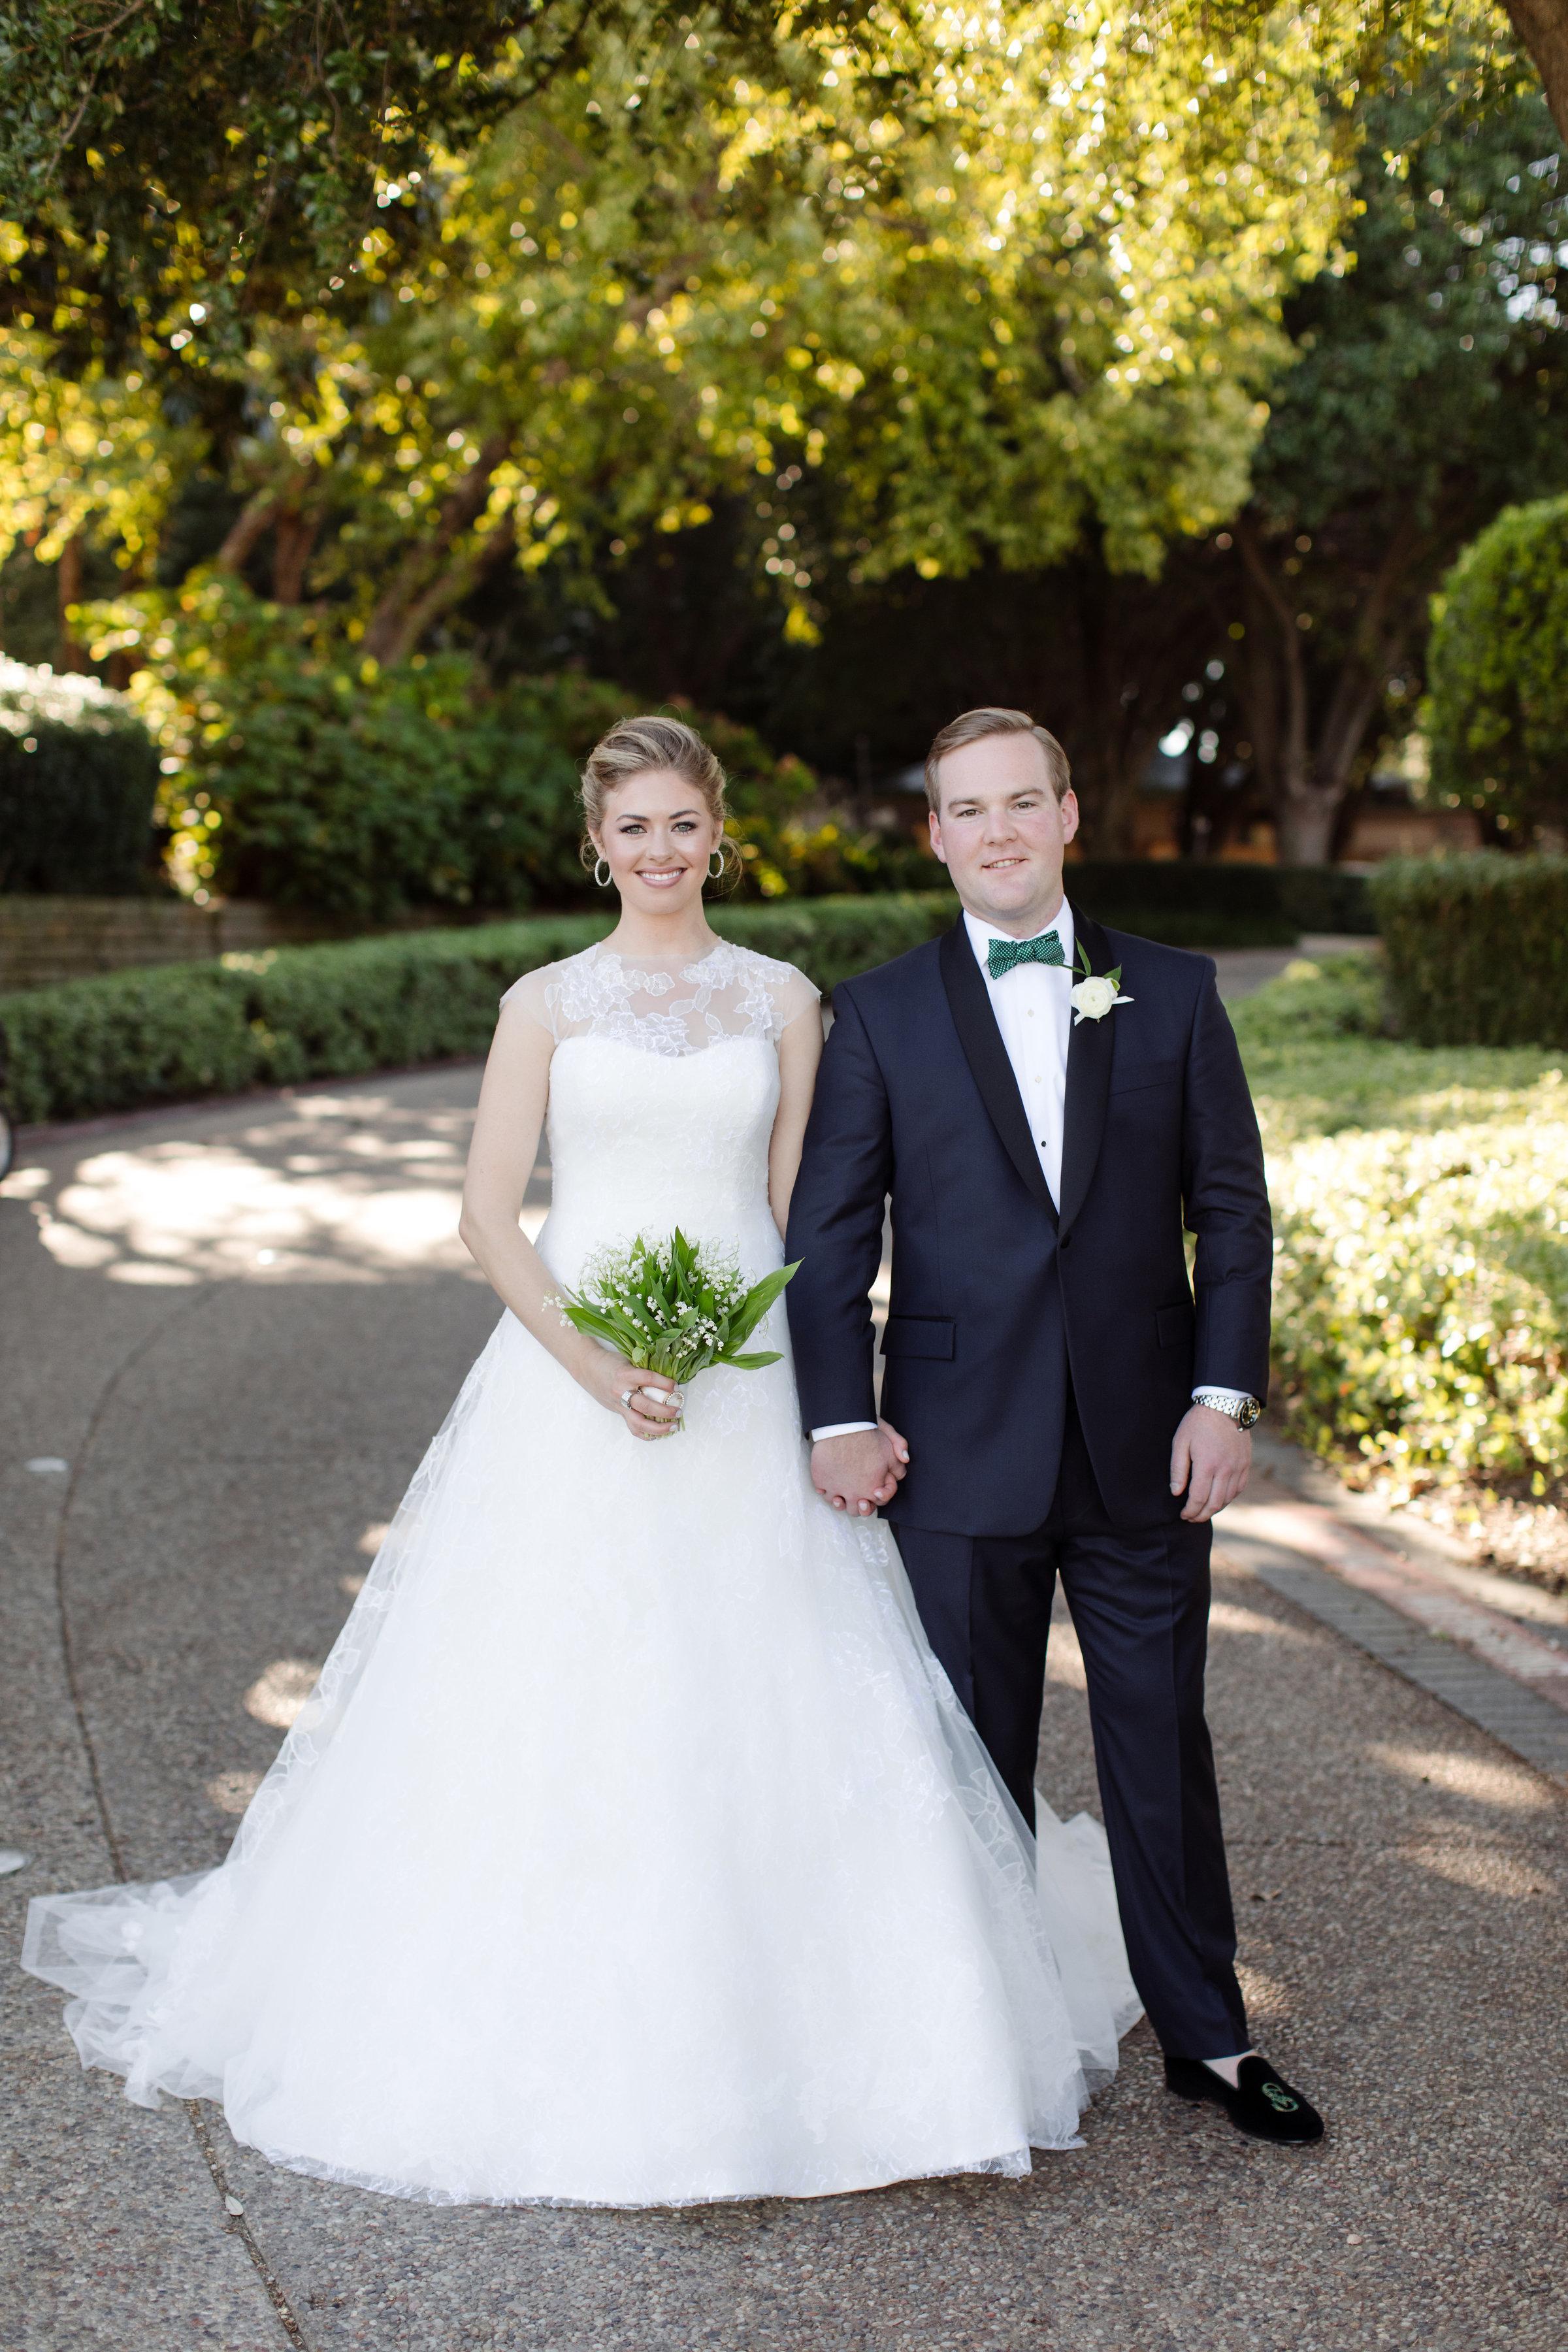 Couple Details - Dallas, Tx - Fall Wedding - Julian Leaver Events